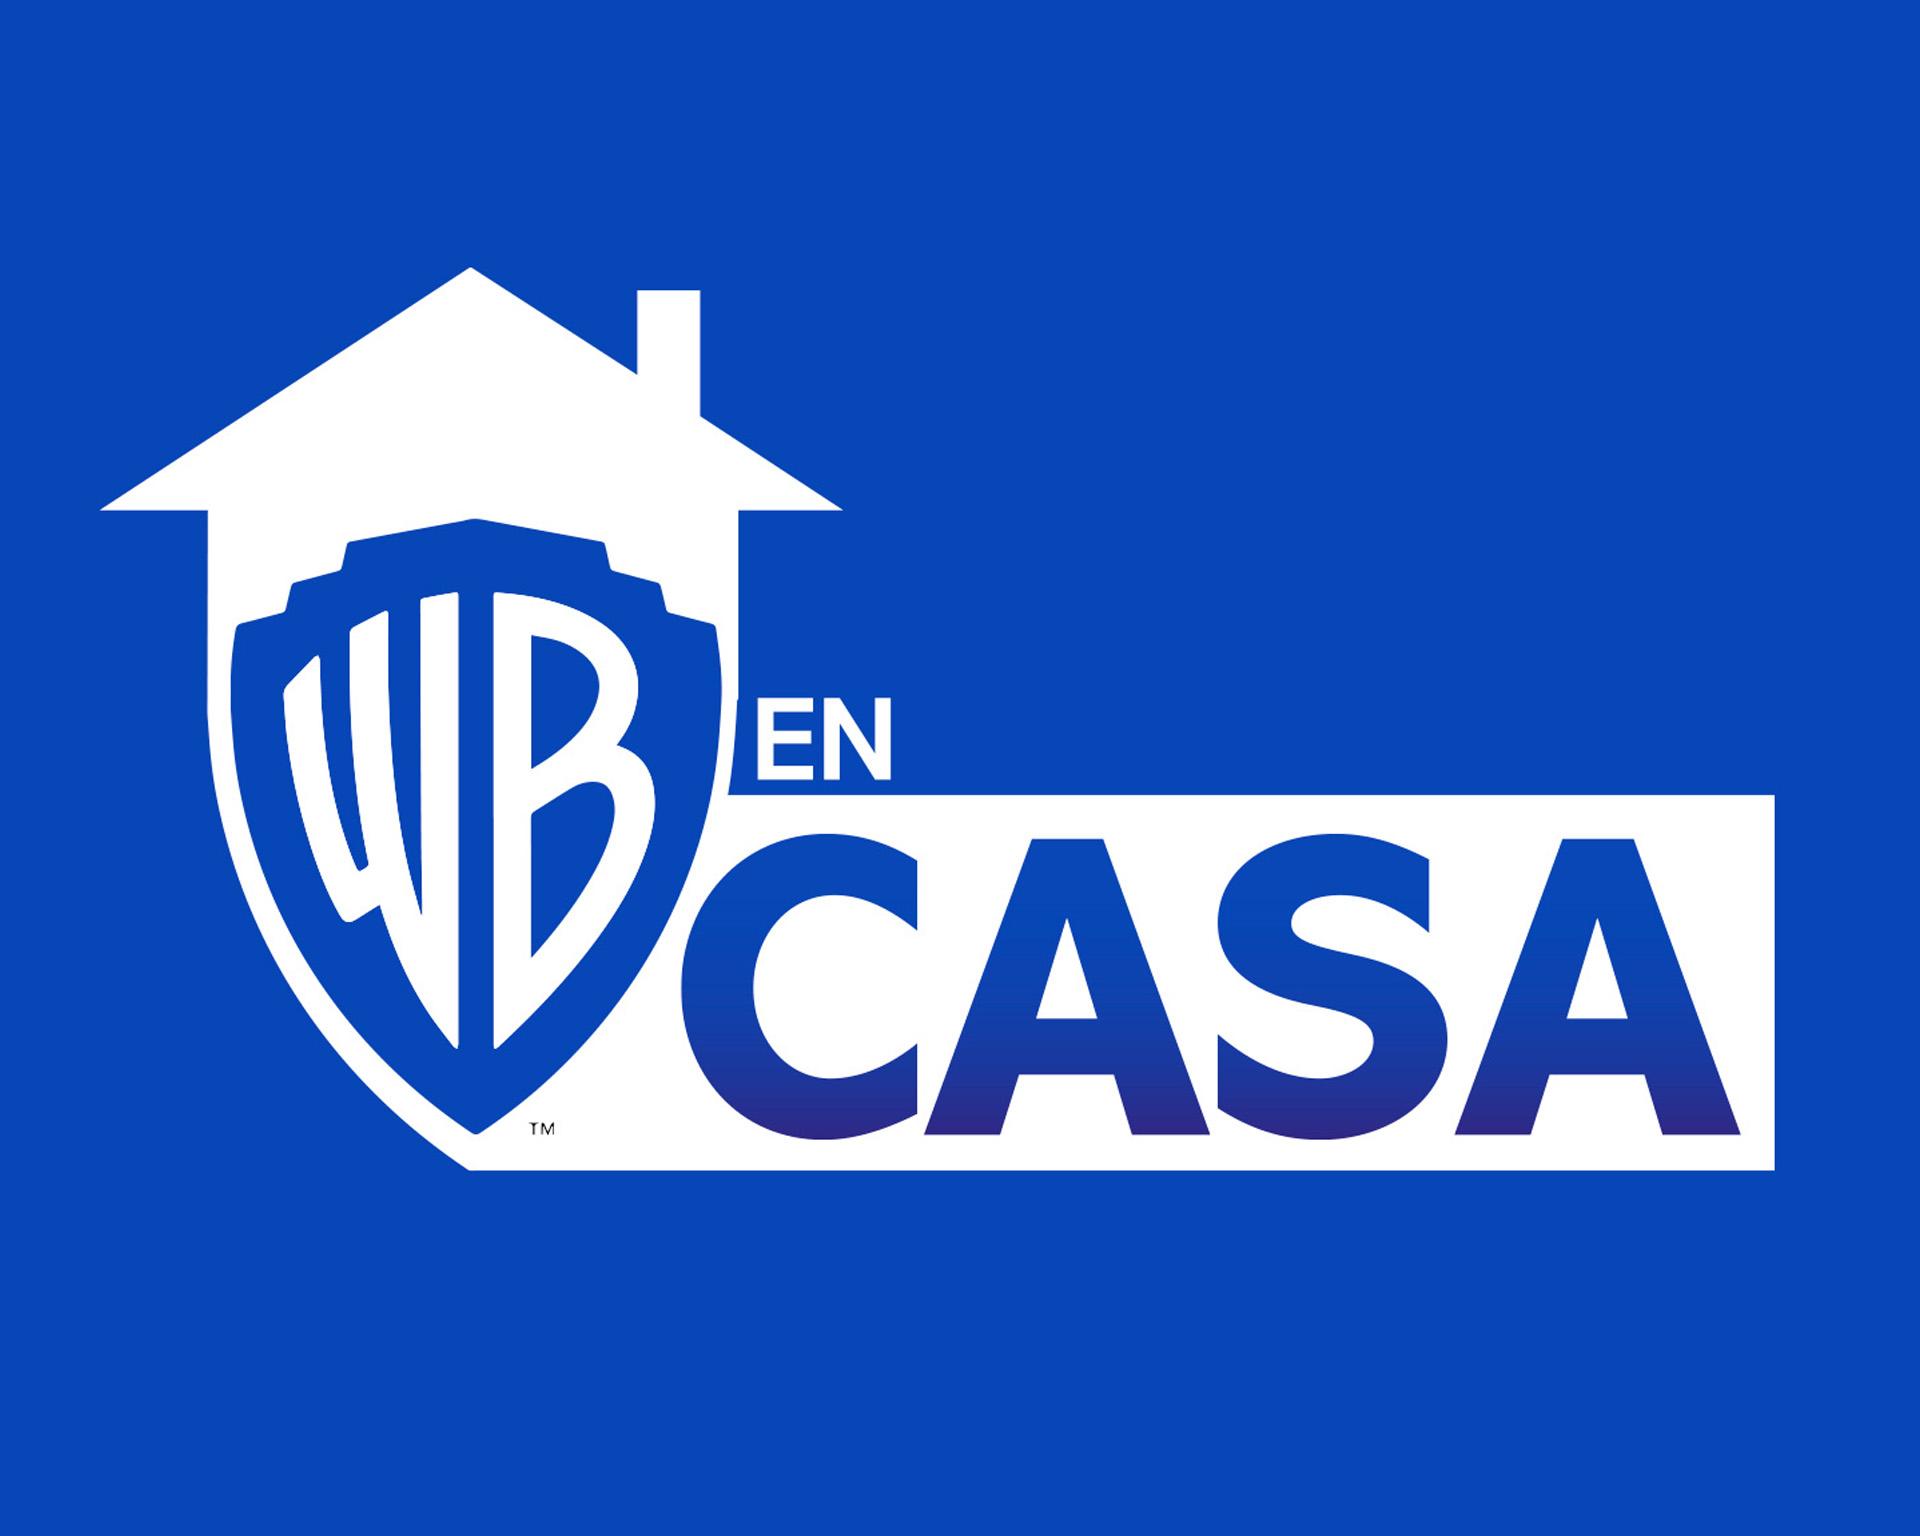 Warner en Casa, WB, Warner Bros.